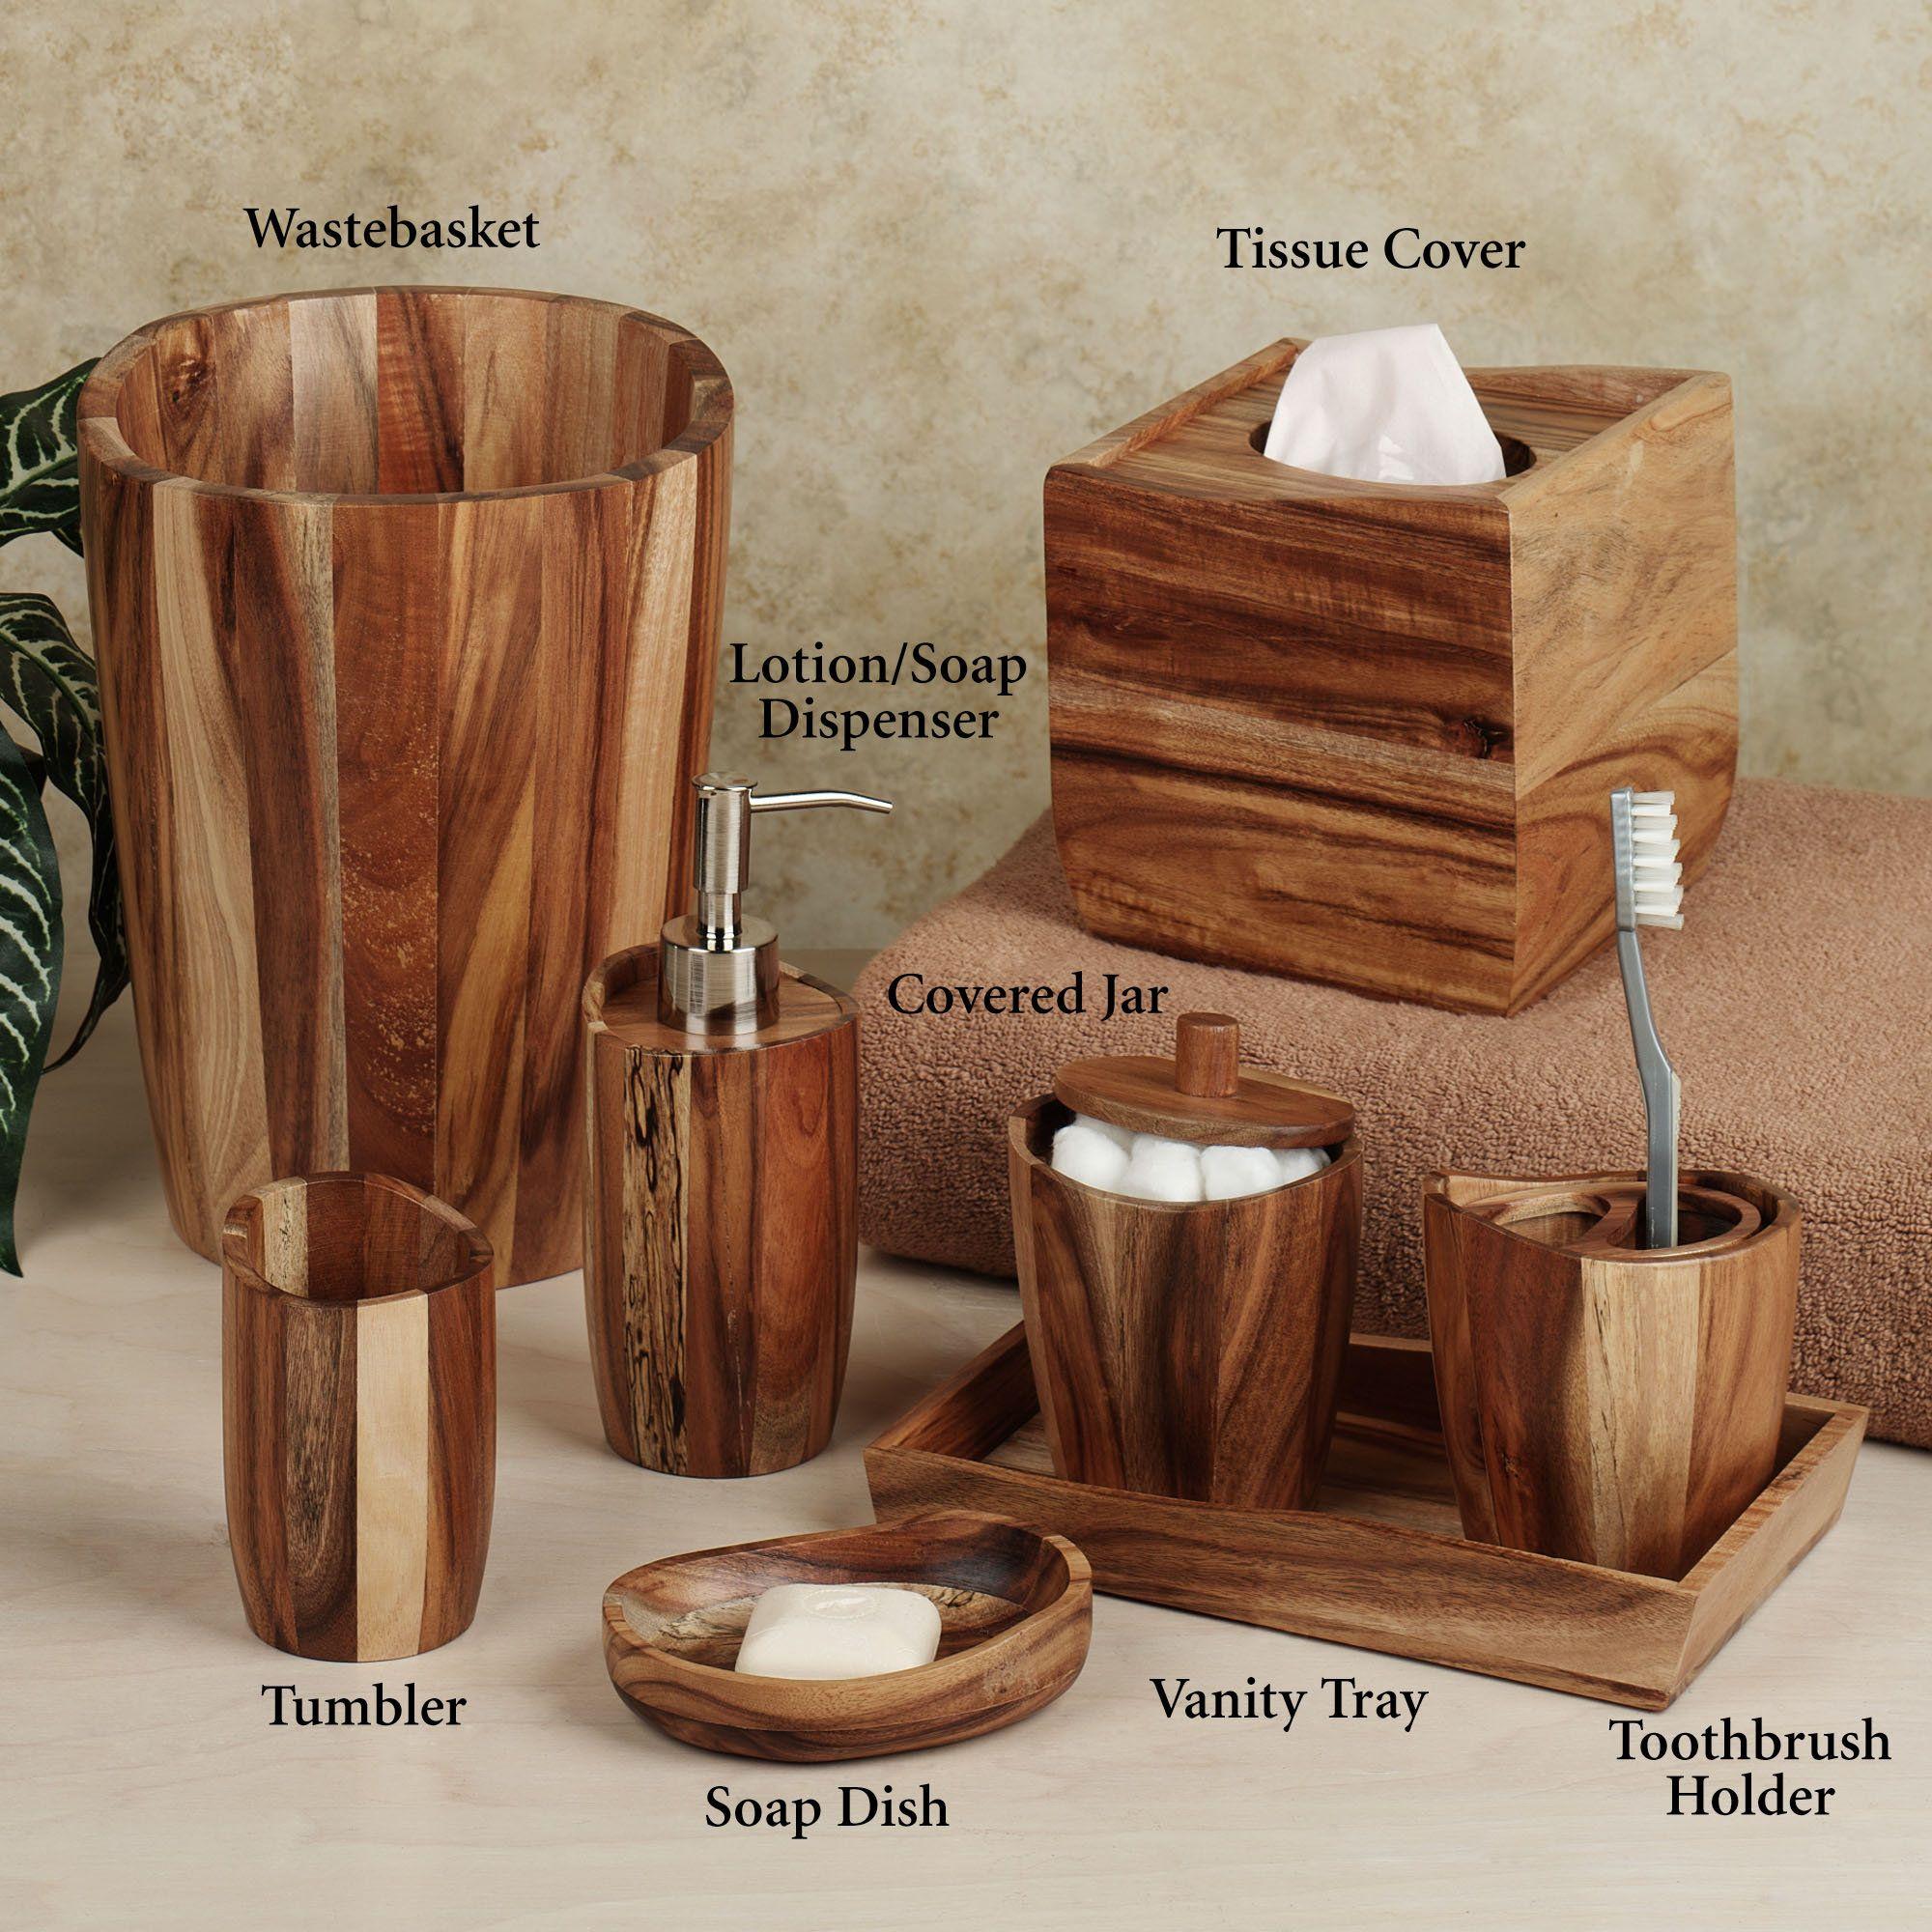 Wood Bathroom Accessories Google Search Bathroom Pinterest